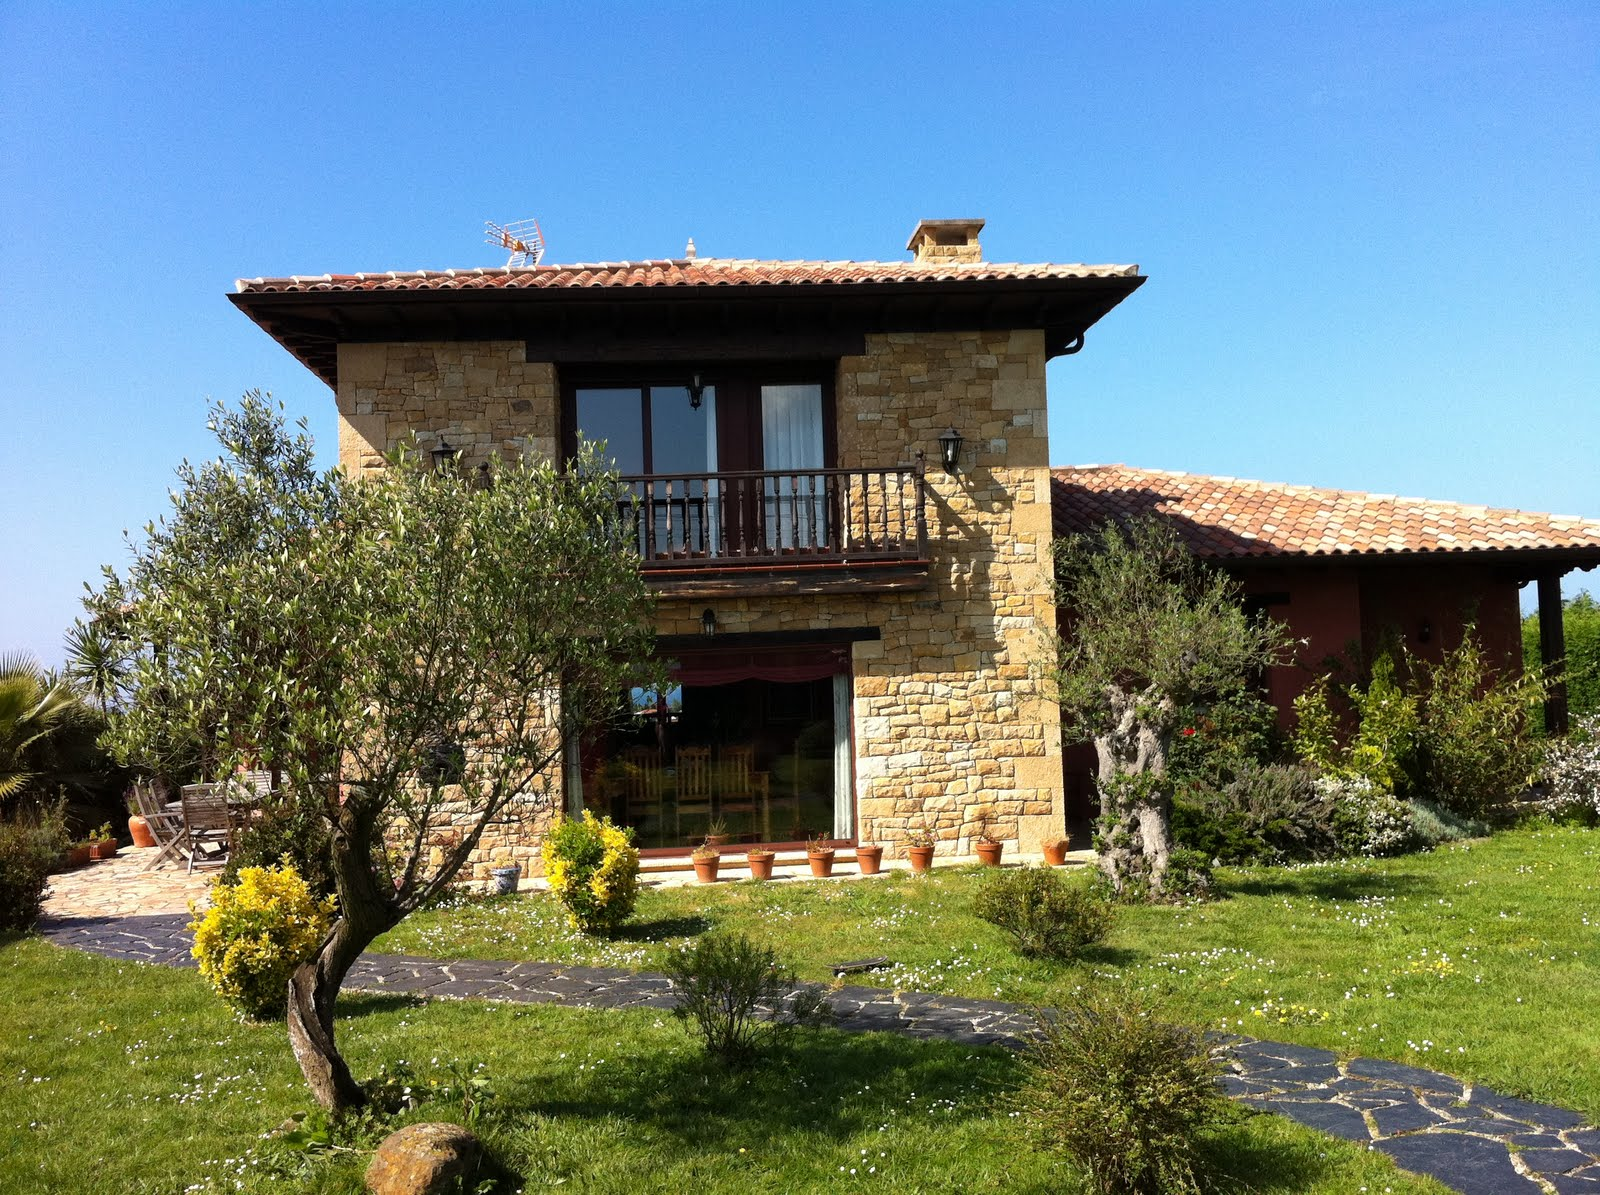 Chalet en venta o alquiler en Quintueles Villaviciosa